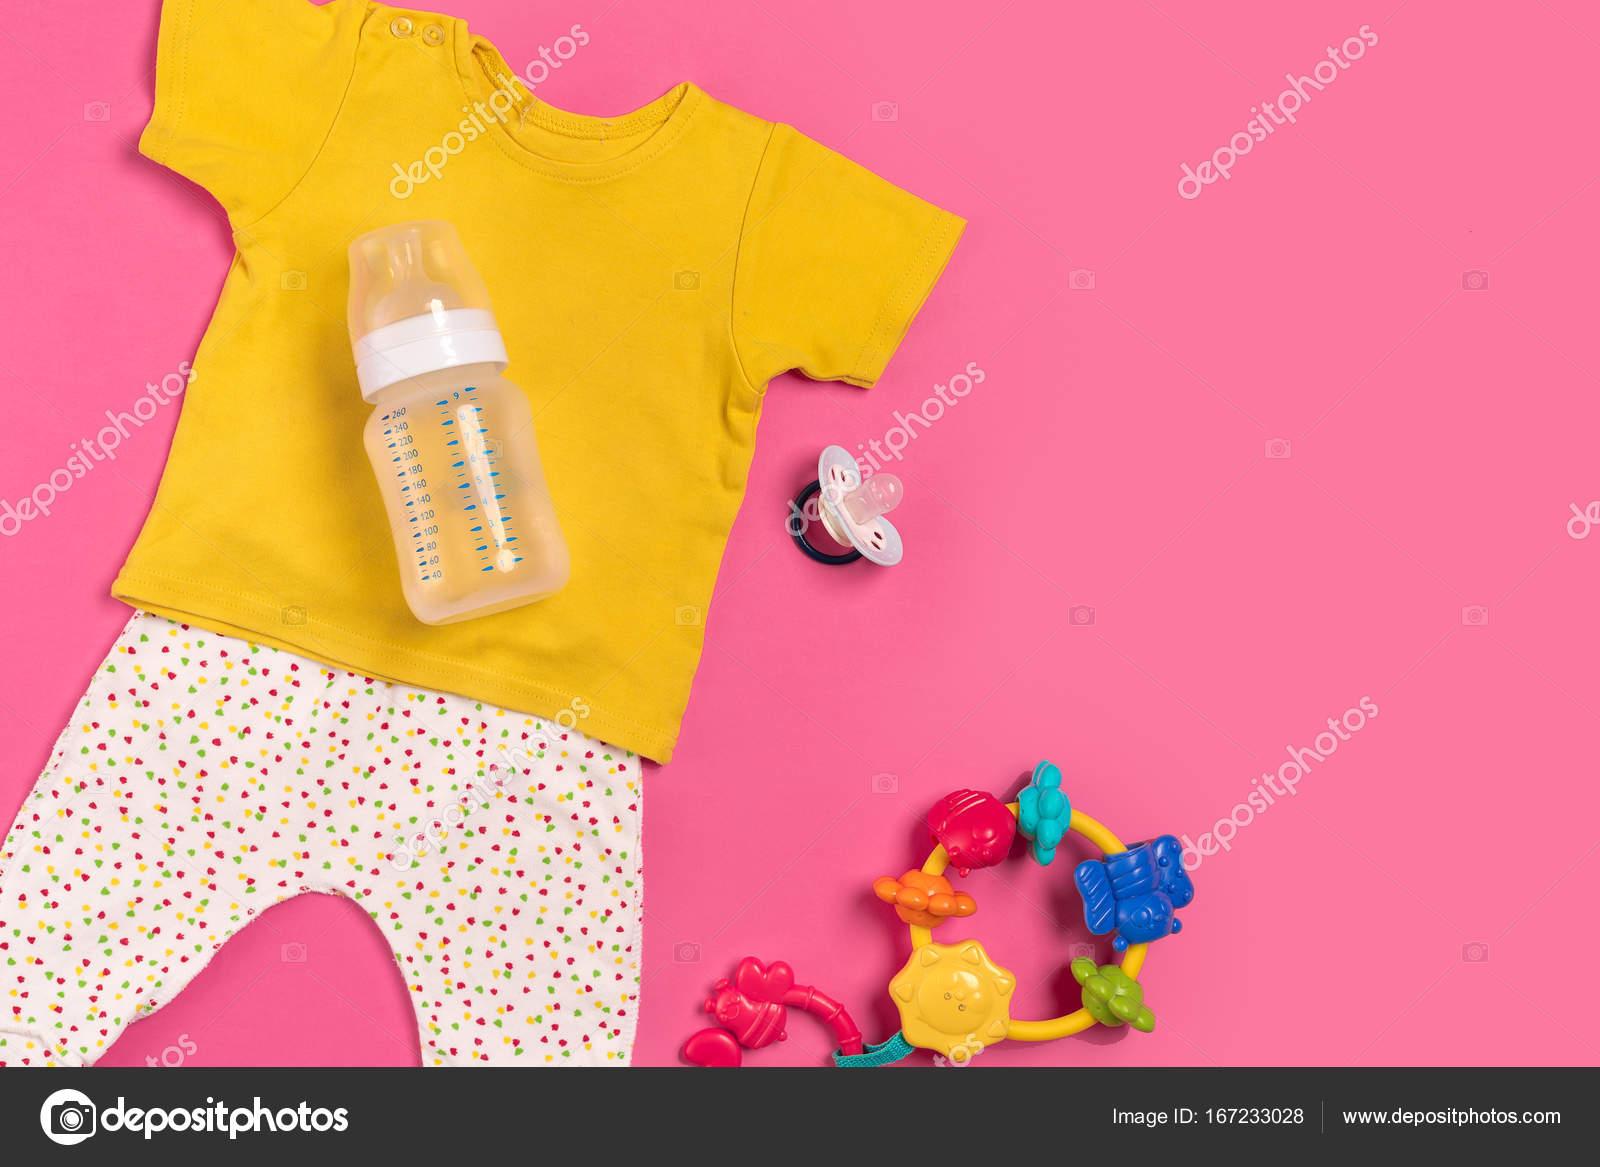 Babykleding Roze.Babykleding En Accessoires Op Roze Achtergrond Bovenaanzicht